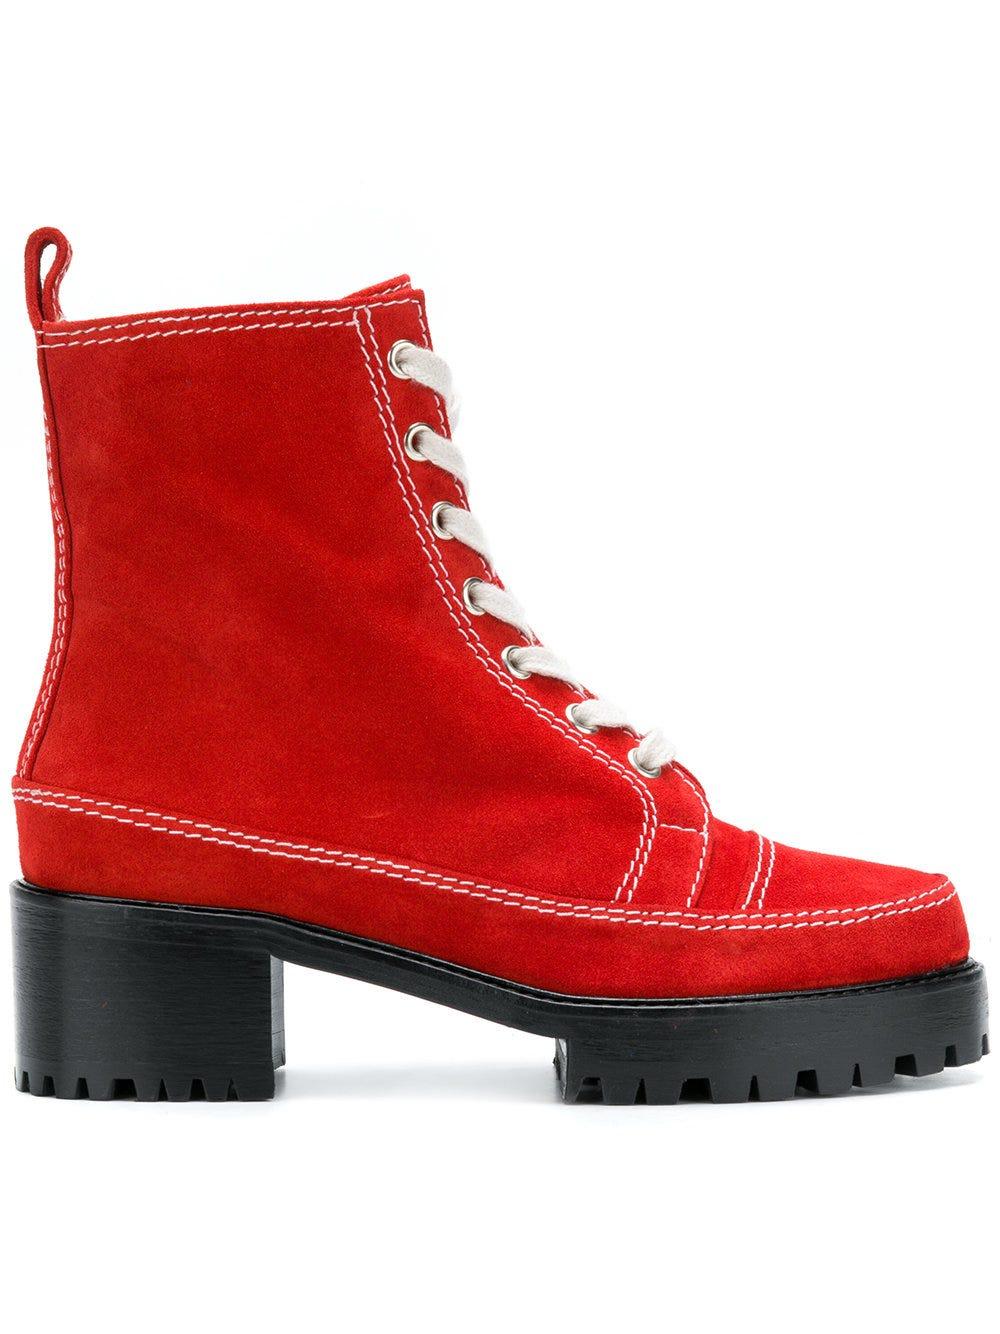 Nicole Saldan? Chris 2.0 boots D7HguM